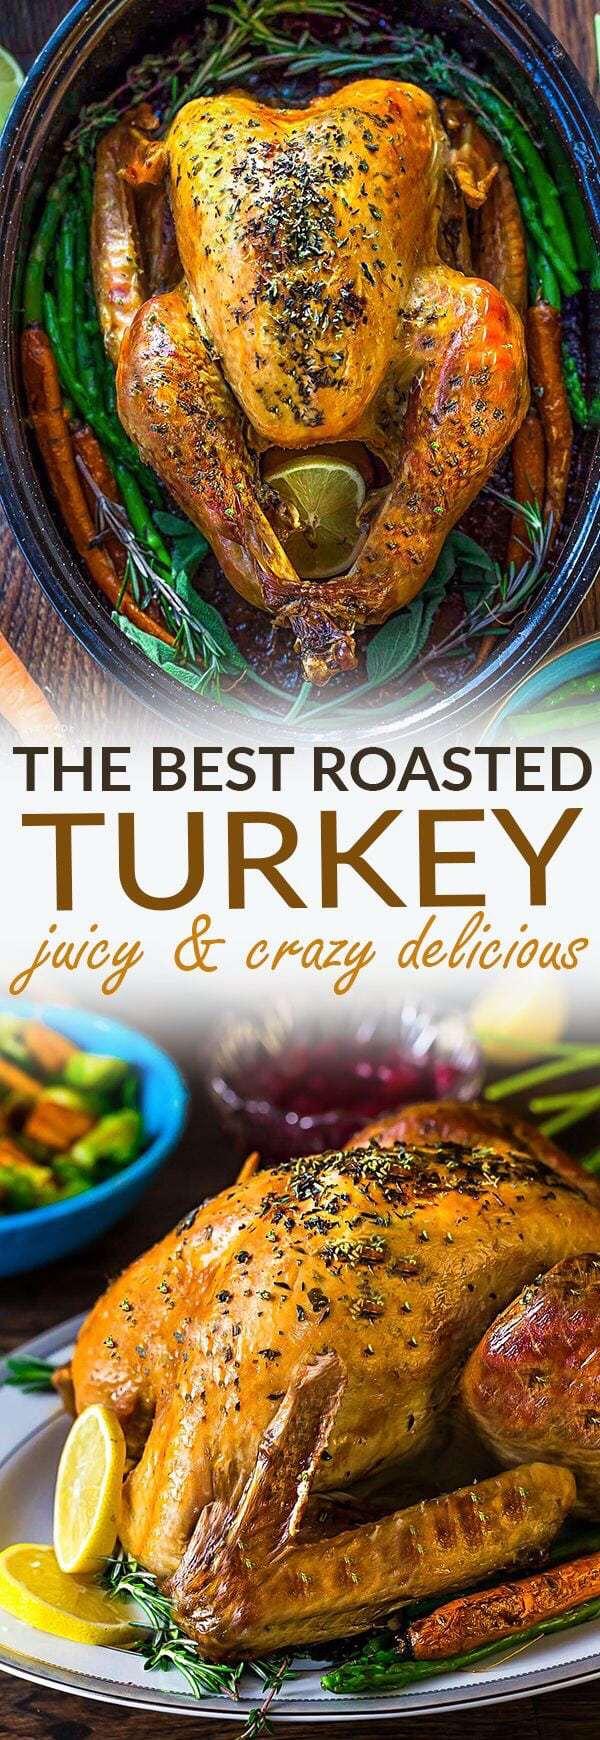 Thanksgiving turkey recipes: Herb Roasted Turkey